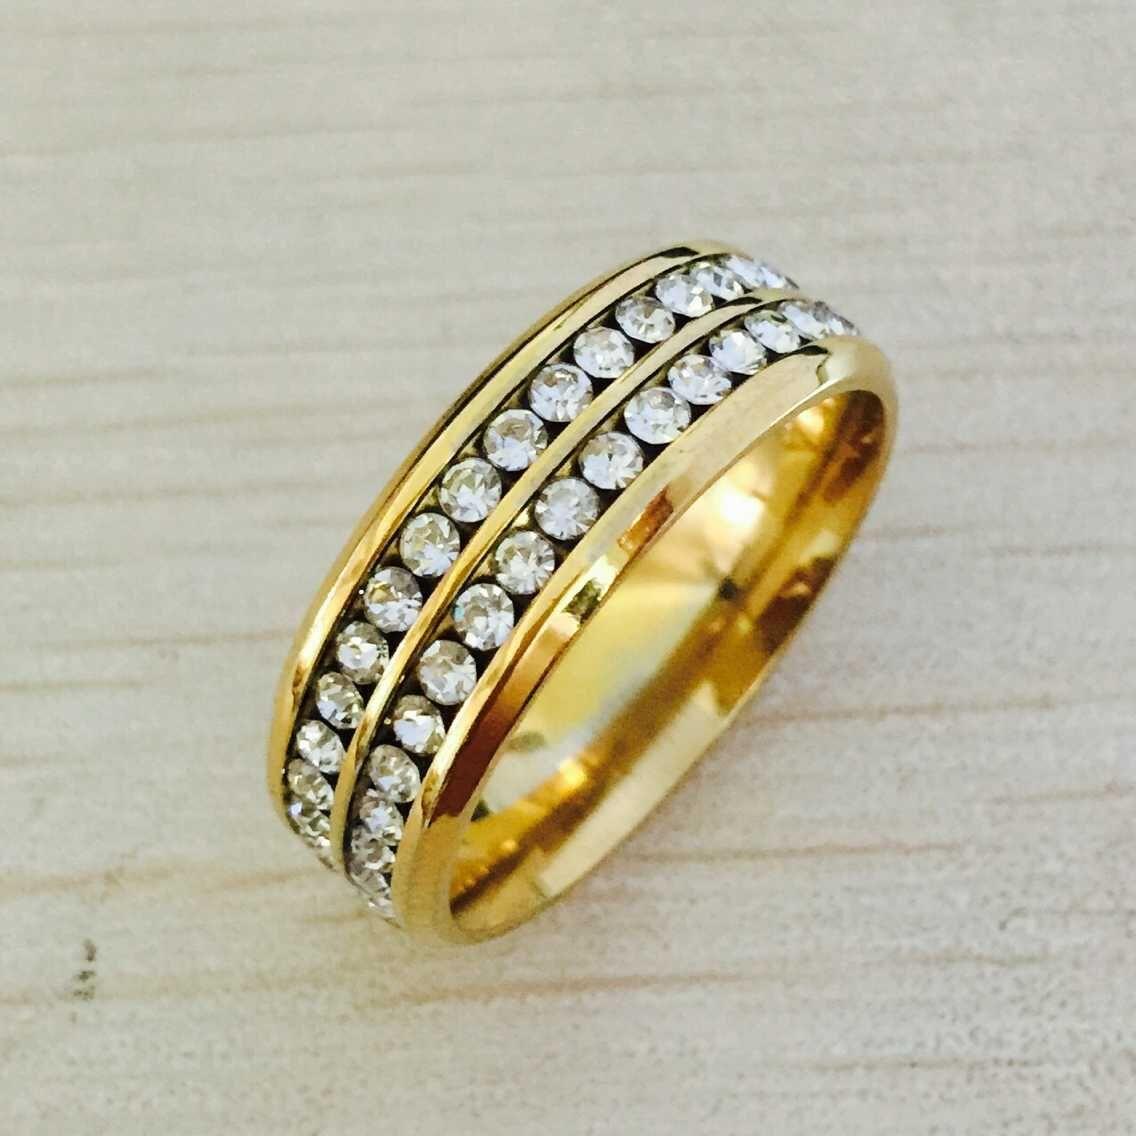 Luxo 18 K banhado a ouro 2 fileira CZ diamante anéis Top Clássico Design amantes da Banda de Casamento Anel para Mulheres e Homens por atacado